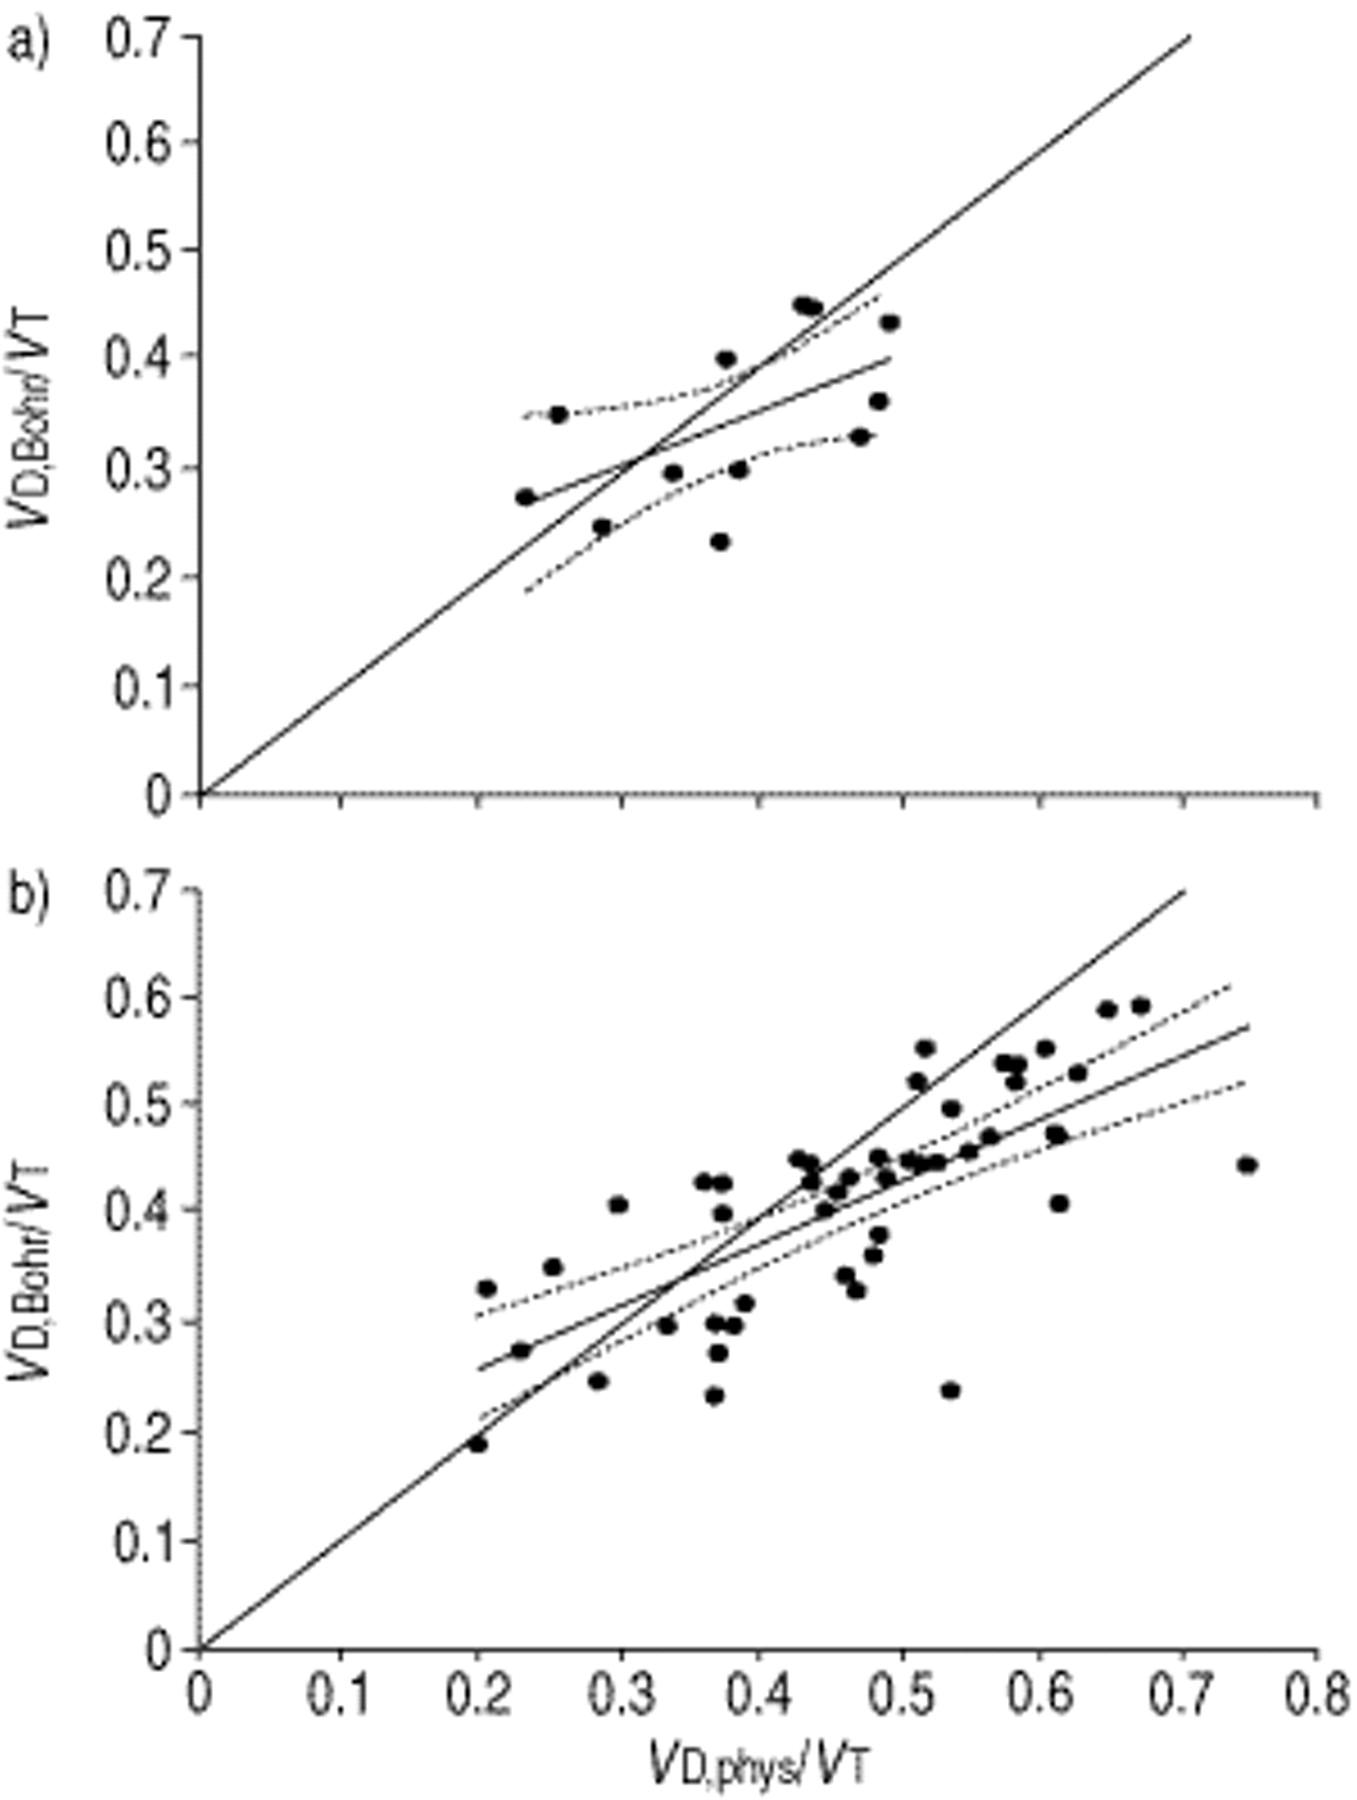 Noninvasive Measurement Of Mean Alveolar Carbon Dioxide